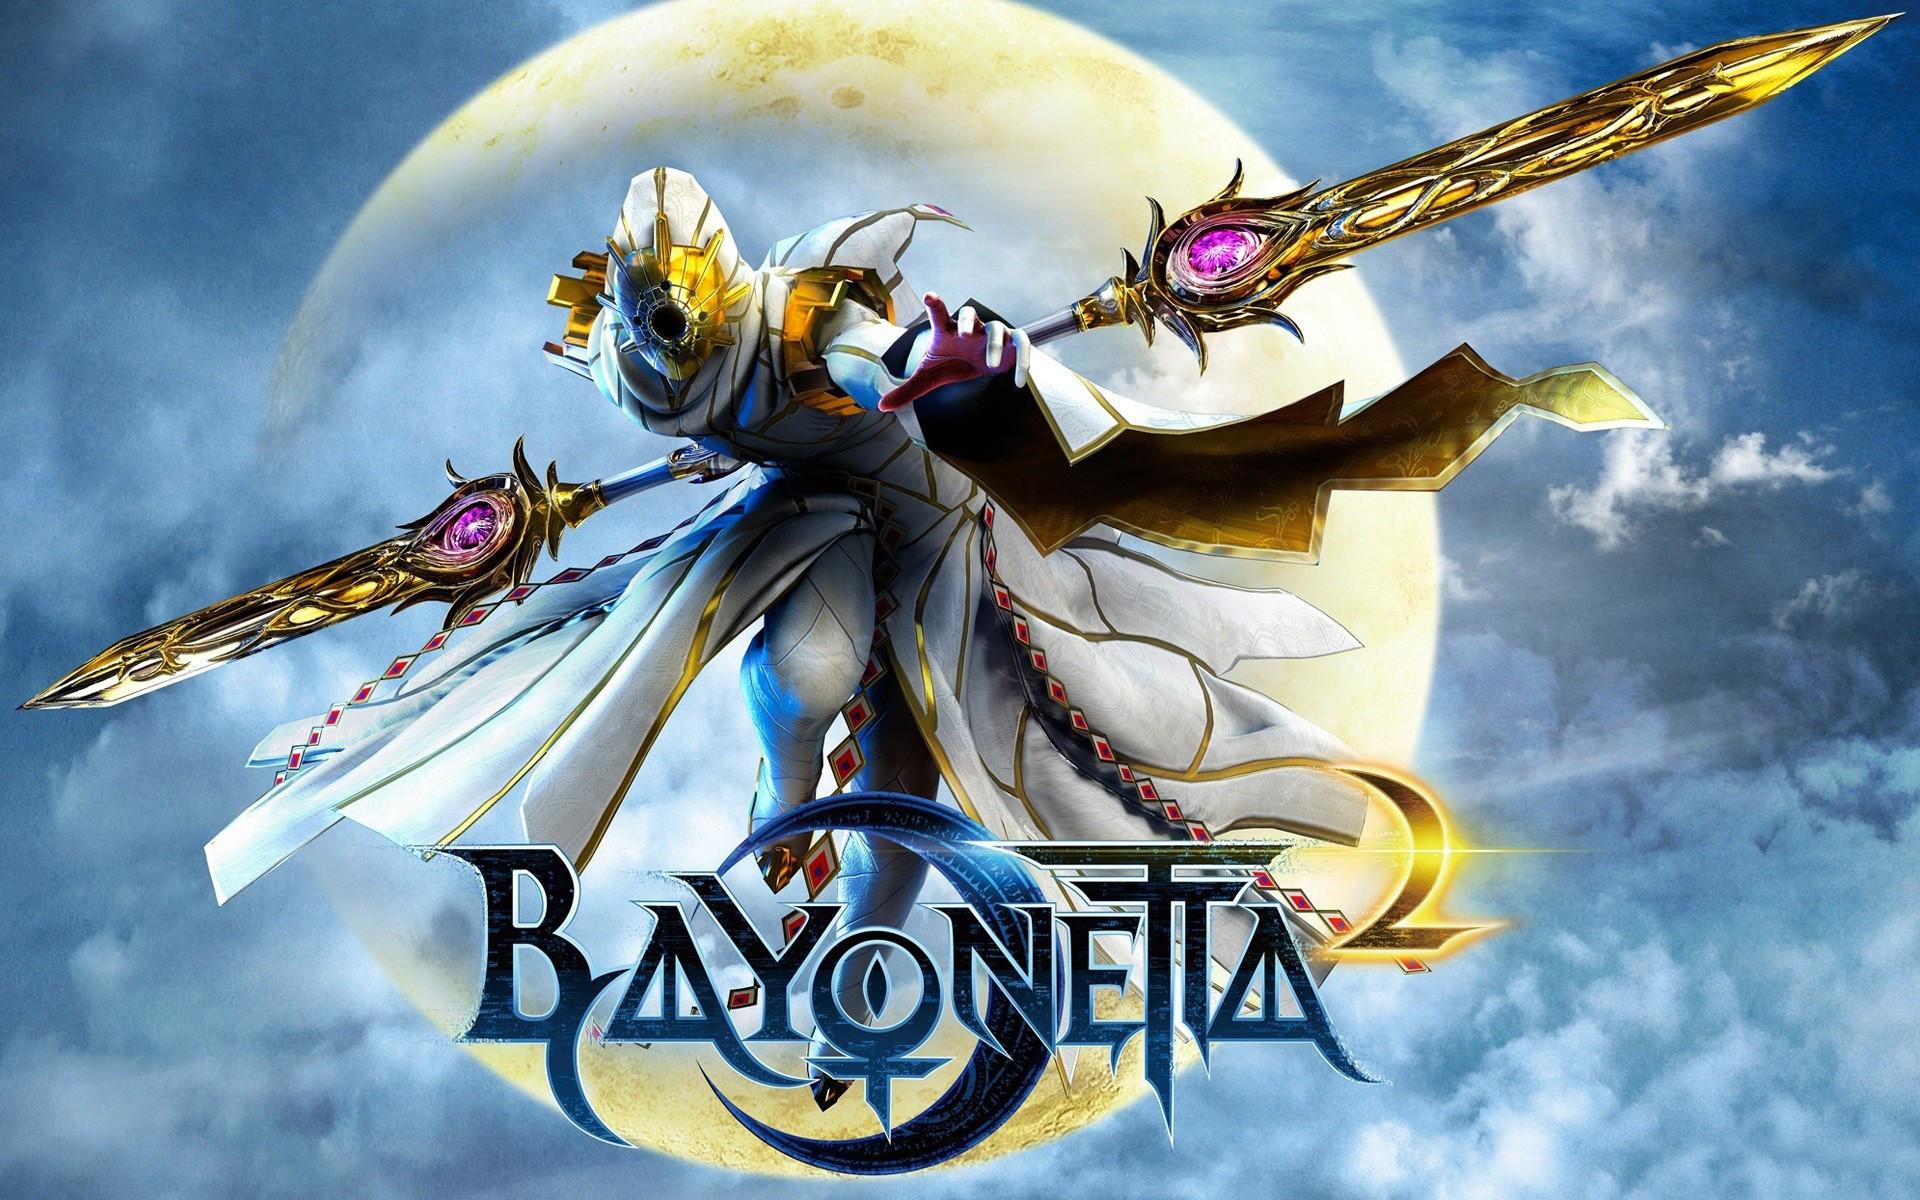 Bayonetta 2 HD Wallpapers Desktop Backgrounds Mobile